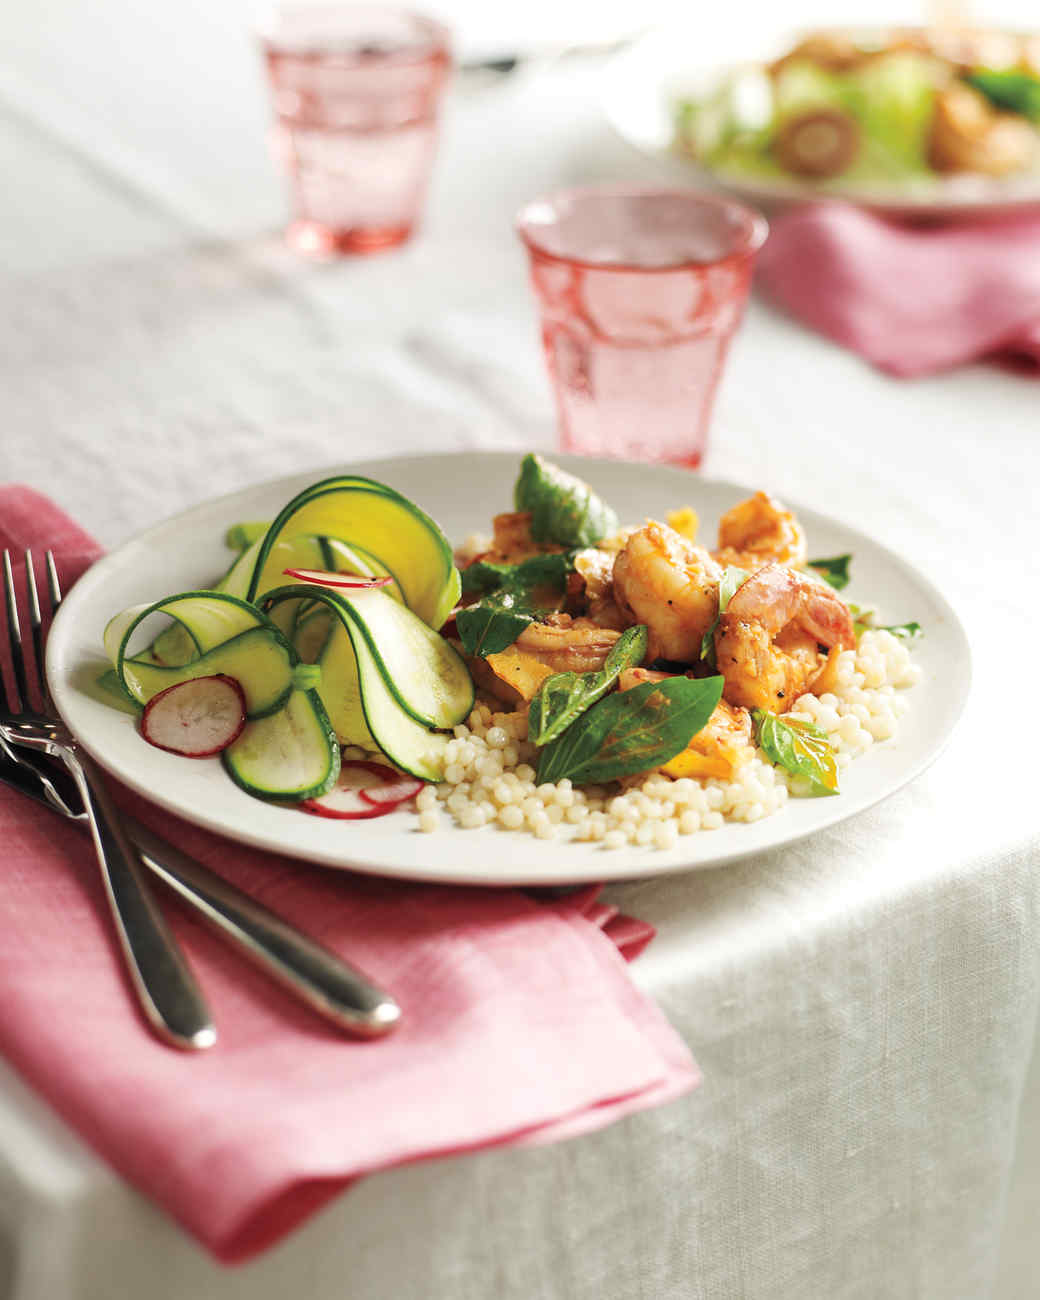 Lemon-Basil Shrimp with Shaved Zucchini Salad